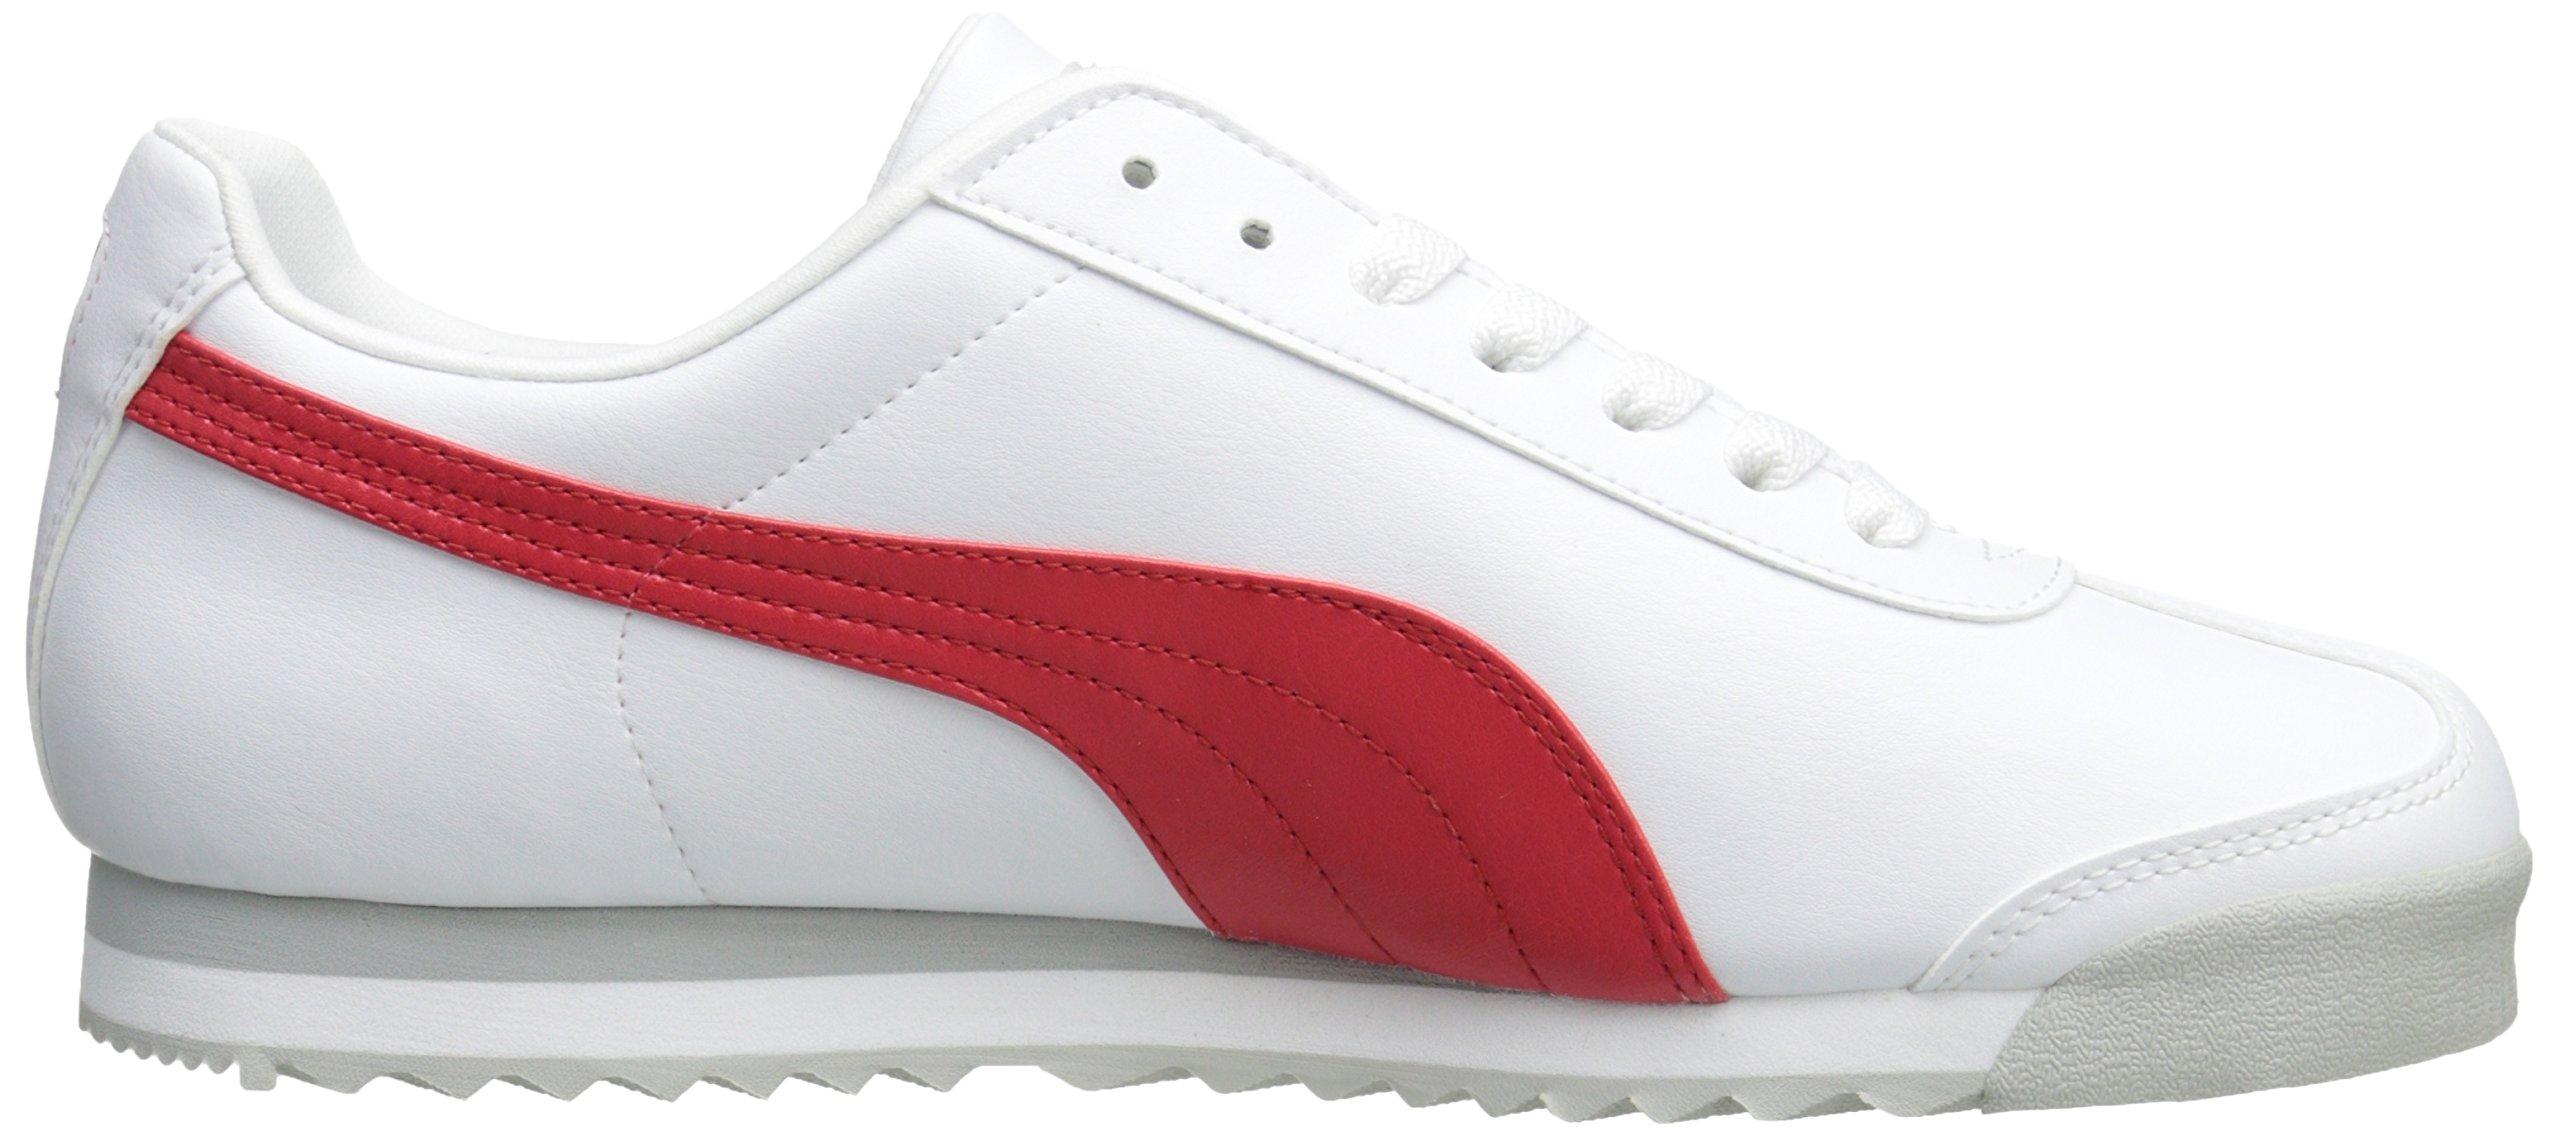 PUMA Men's Roma Basic Fashion Sneaker, White/High Risk Red/White - 9 D(M) US by PUMA (Image #7)